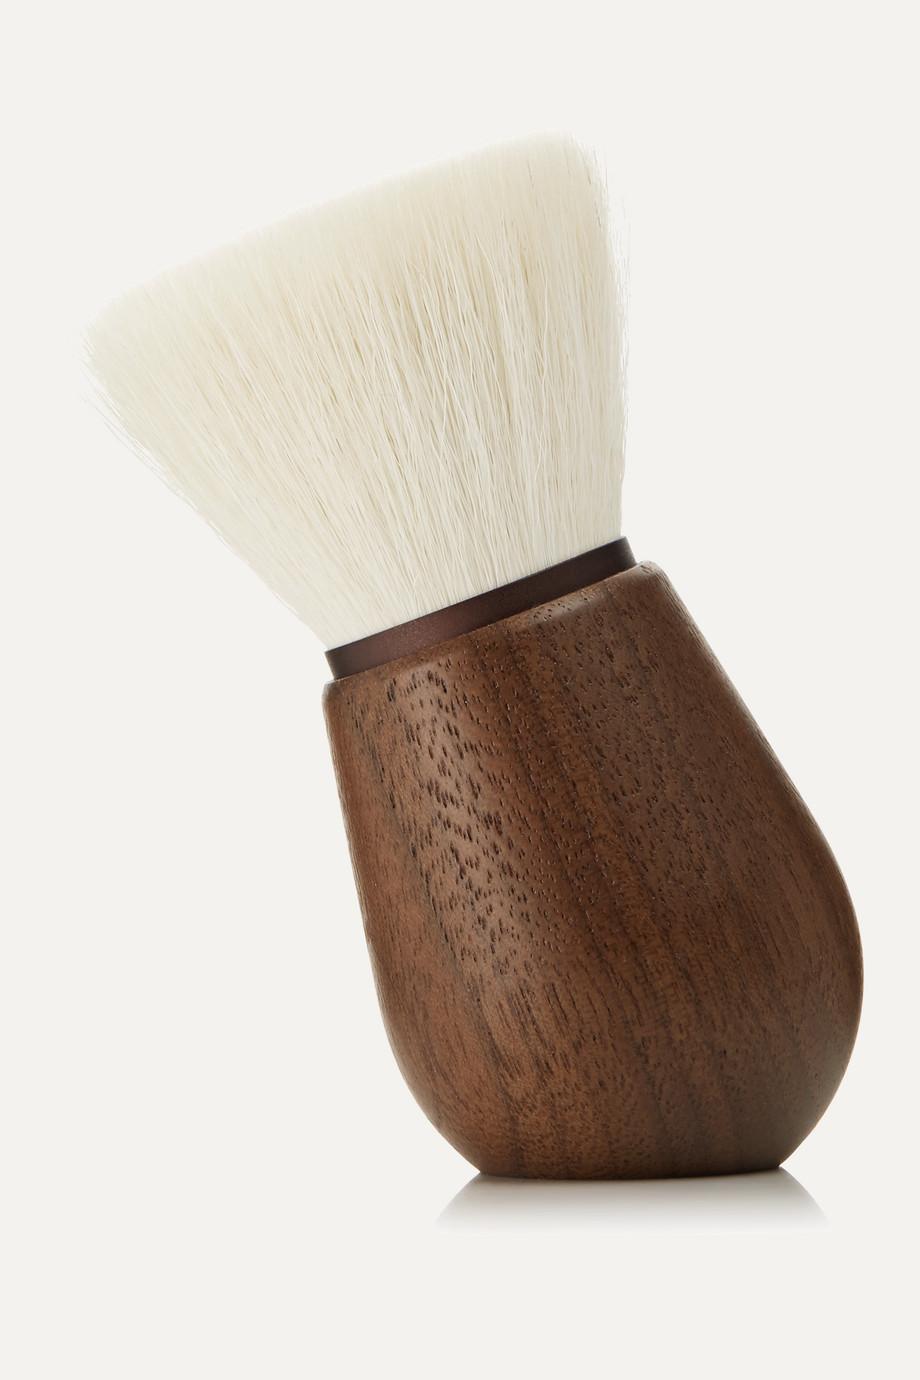 SHAQUDA Suvé Face Cleansing Brush